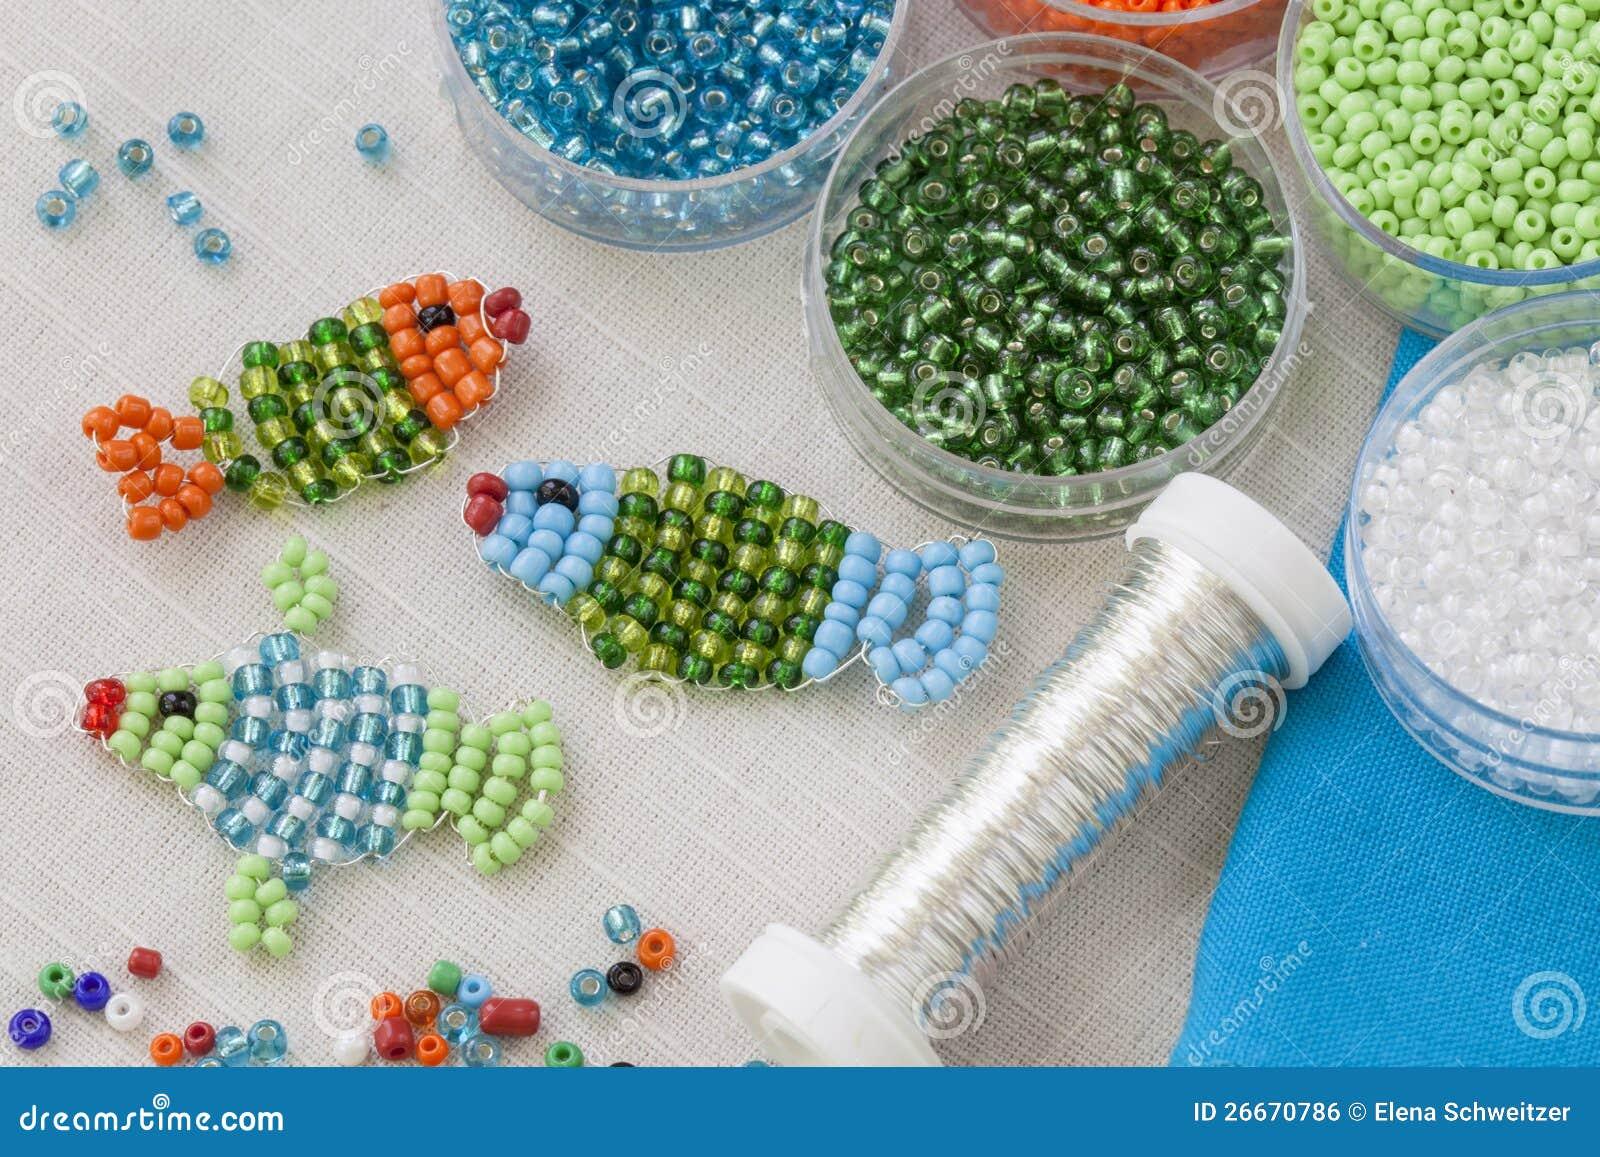 Bead craft stock photo. Image of childhood, craft, jewelry - 26670786